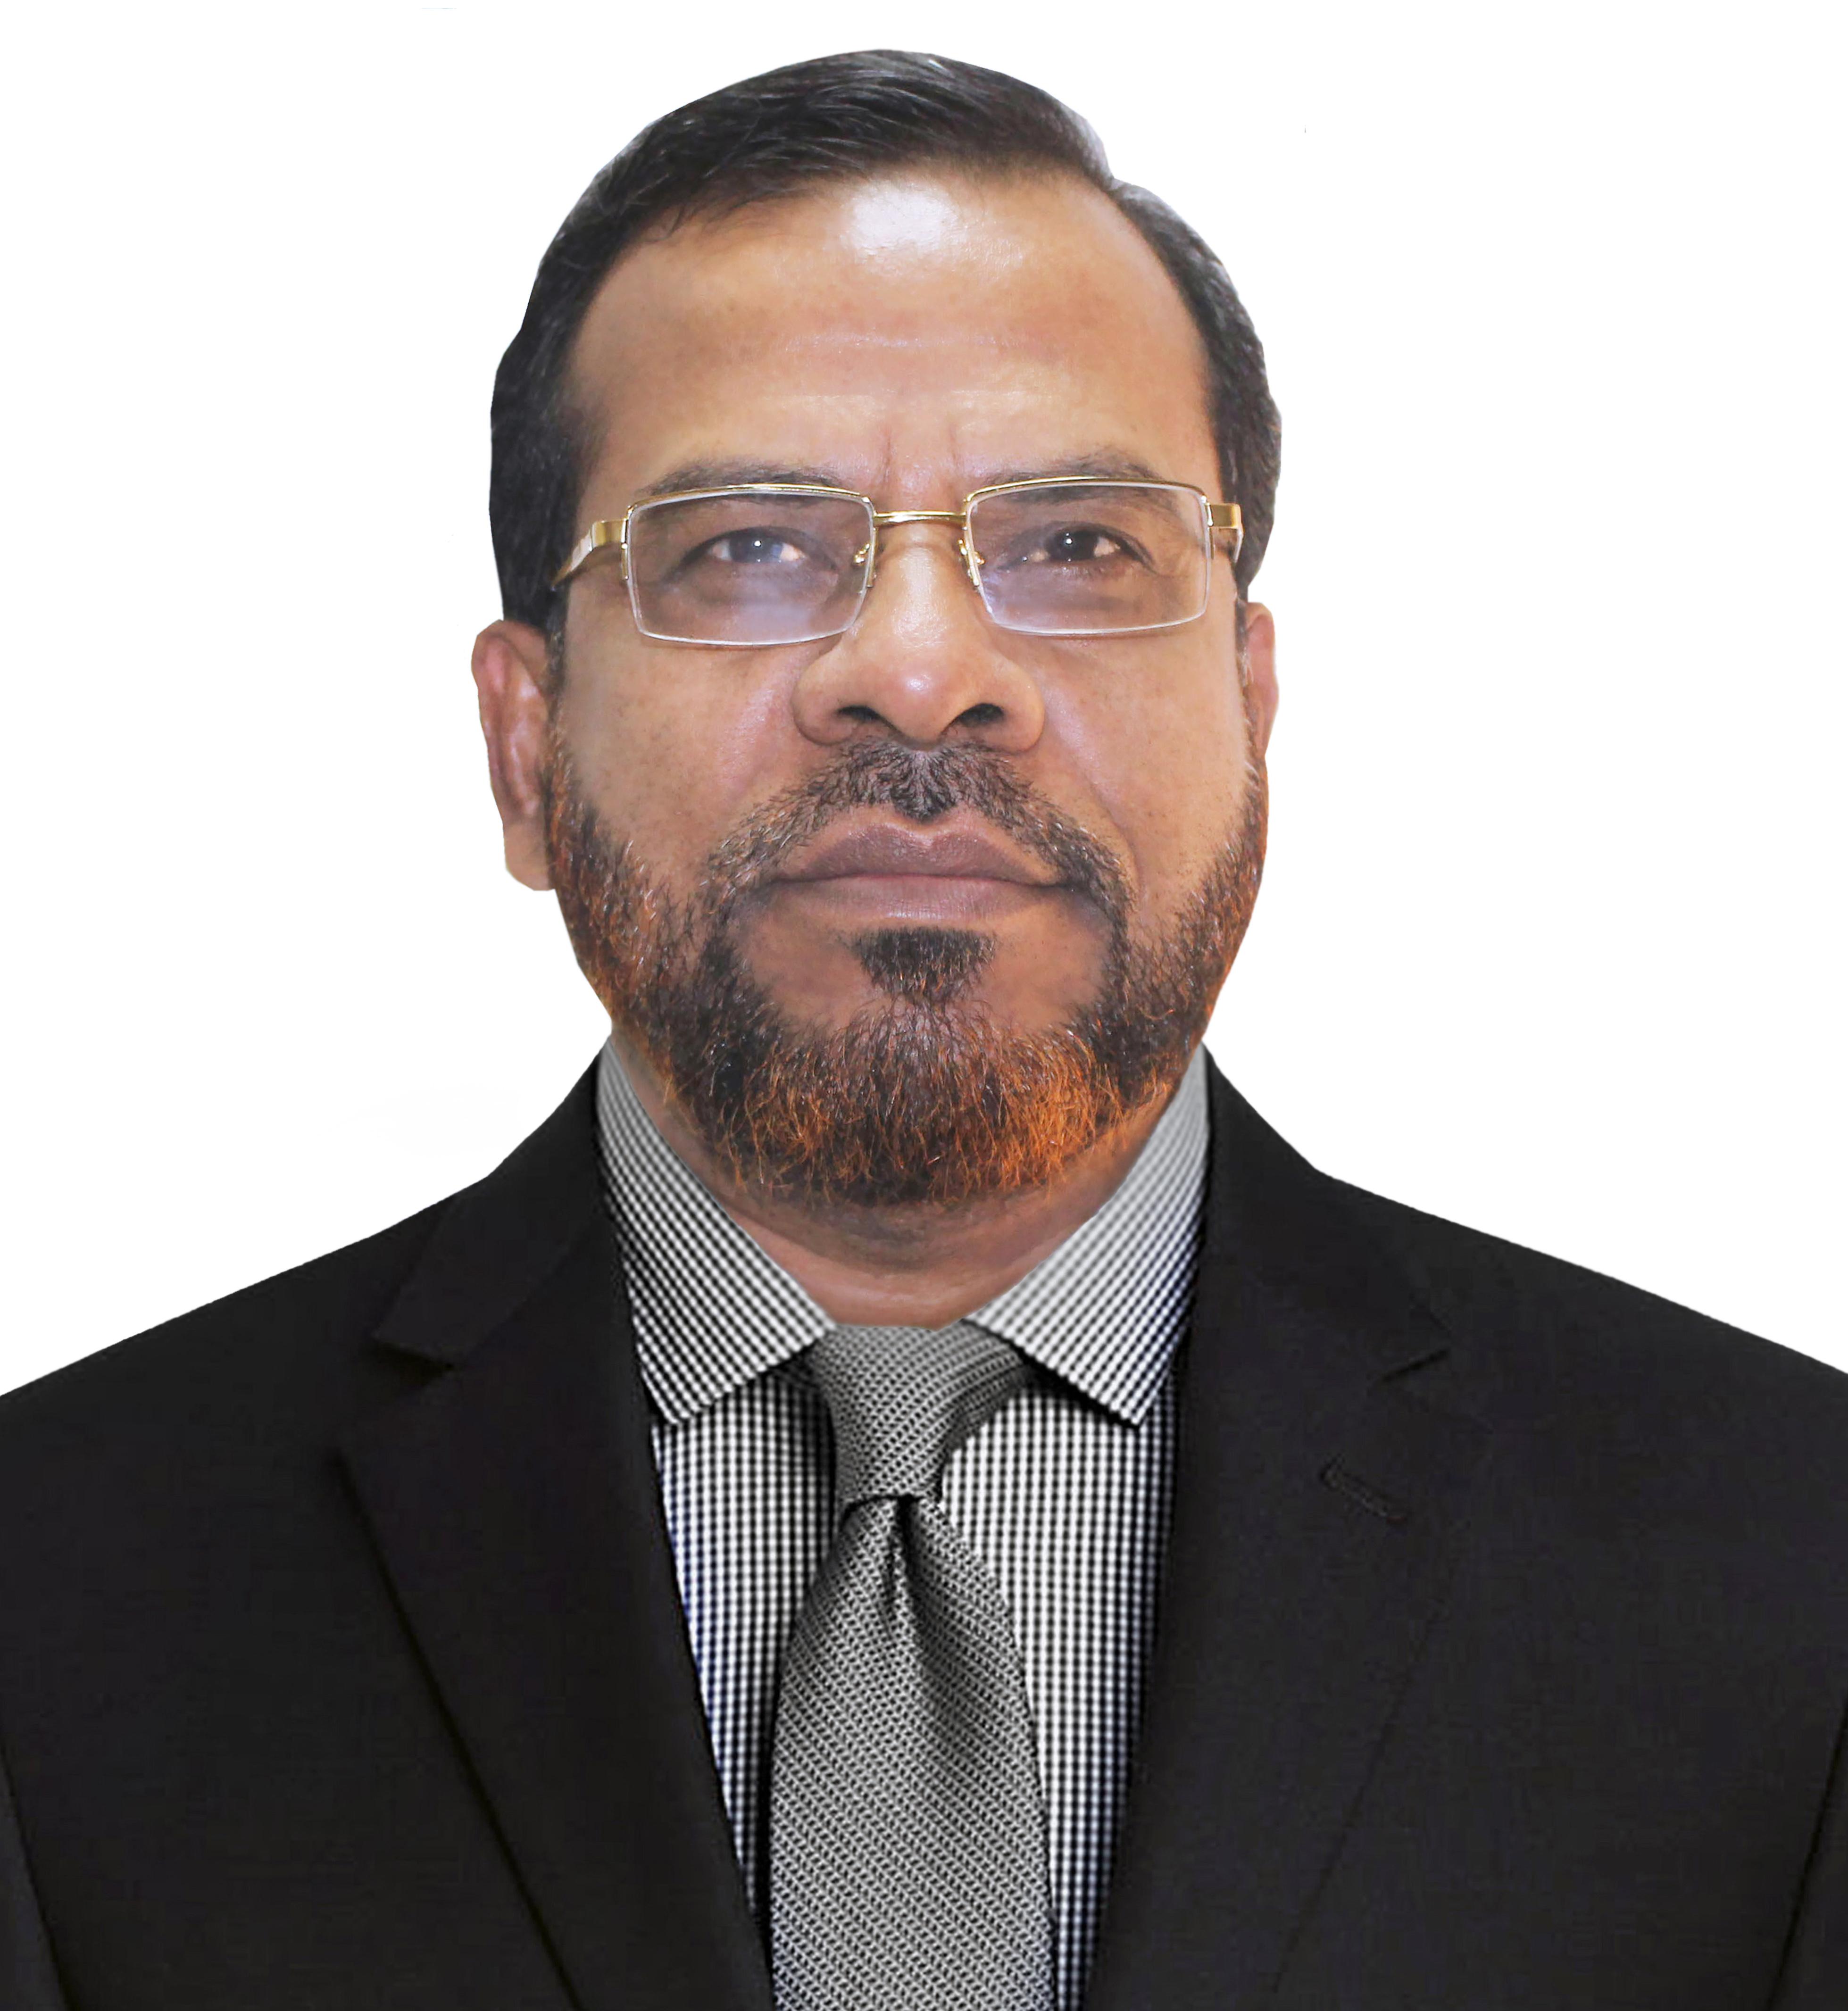 Mr. Mominul Haque Majumder